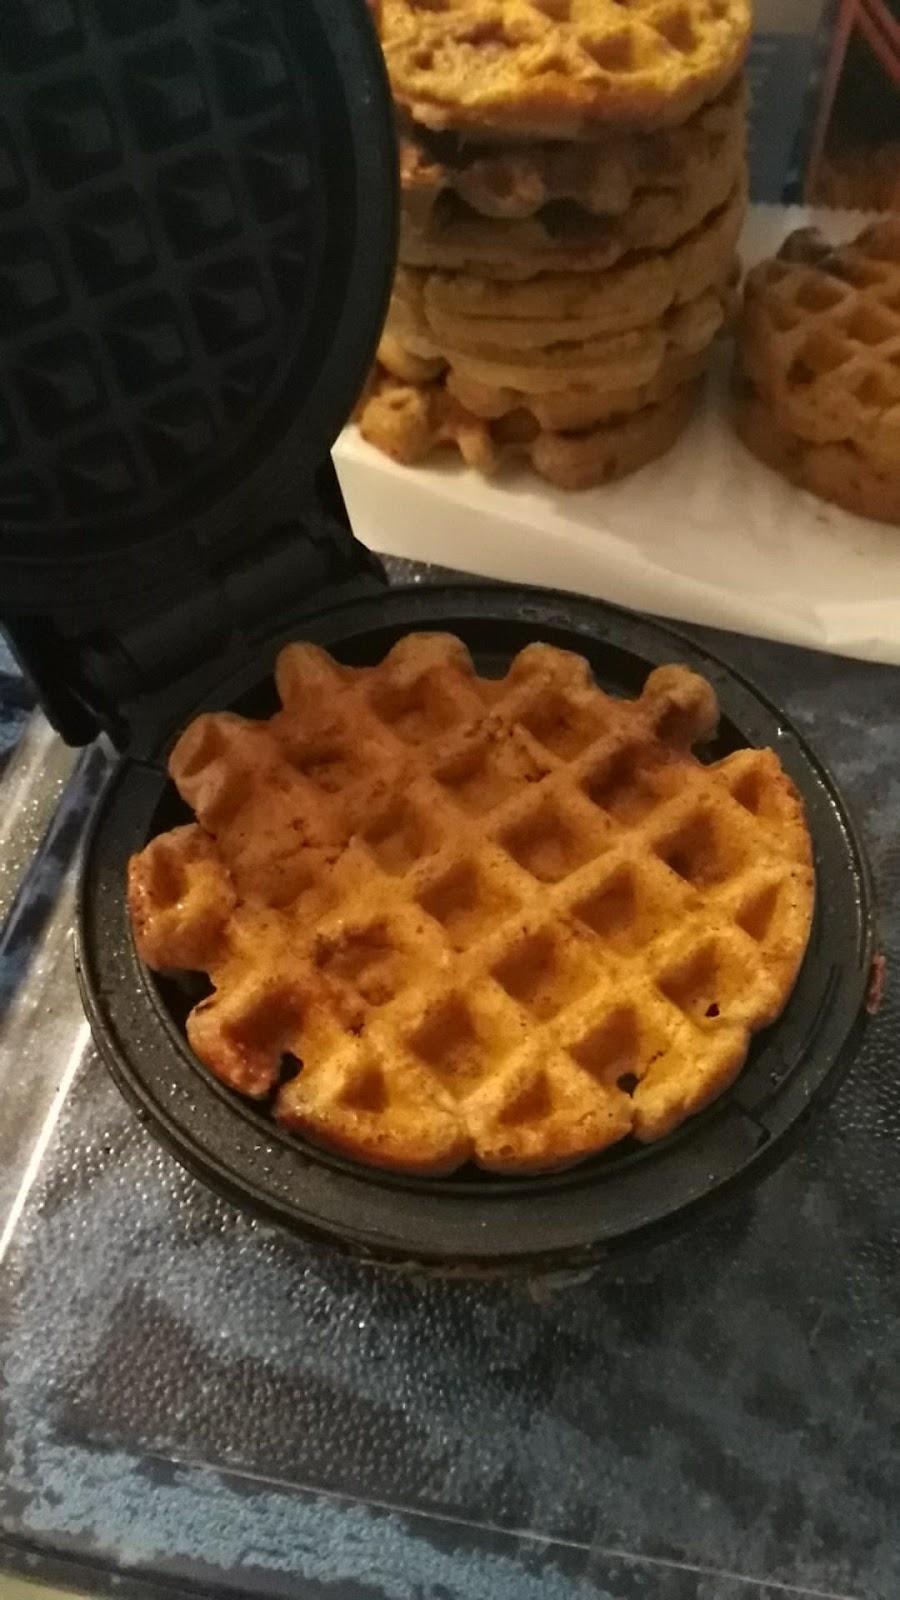 optavia macaroni and cheese hack